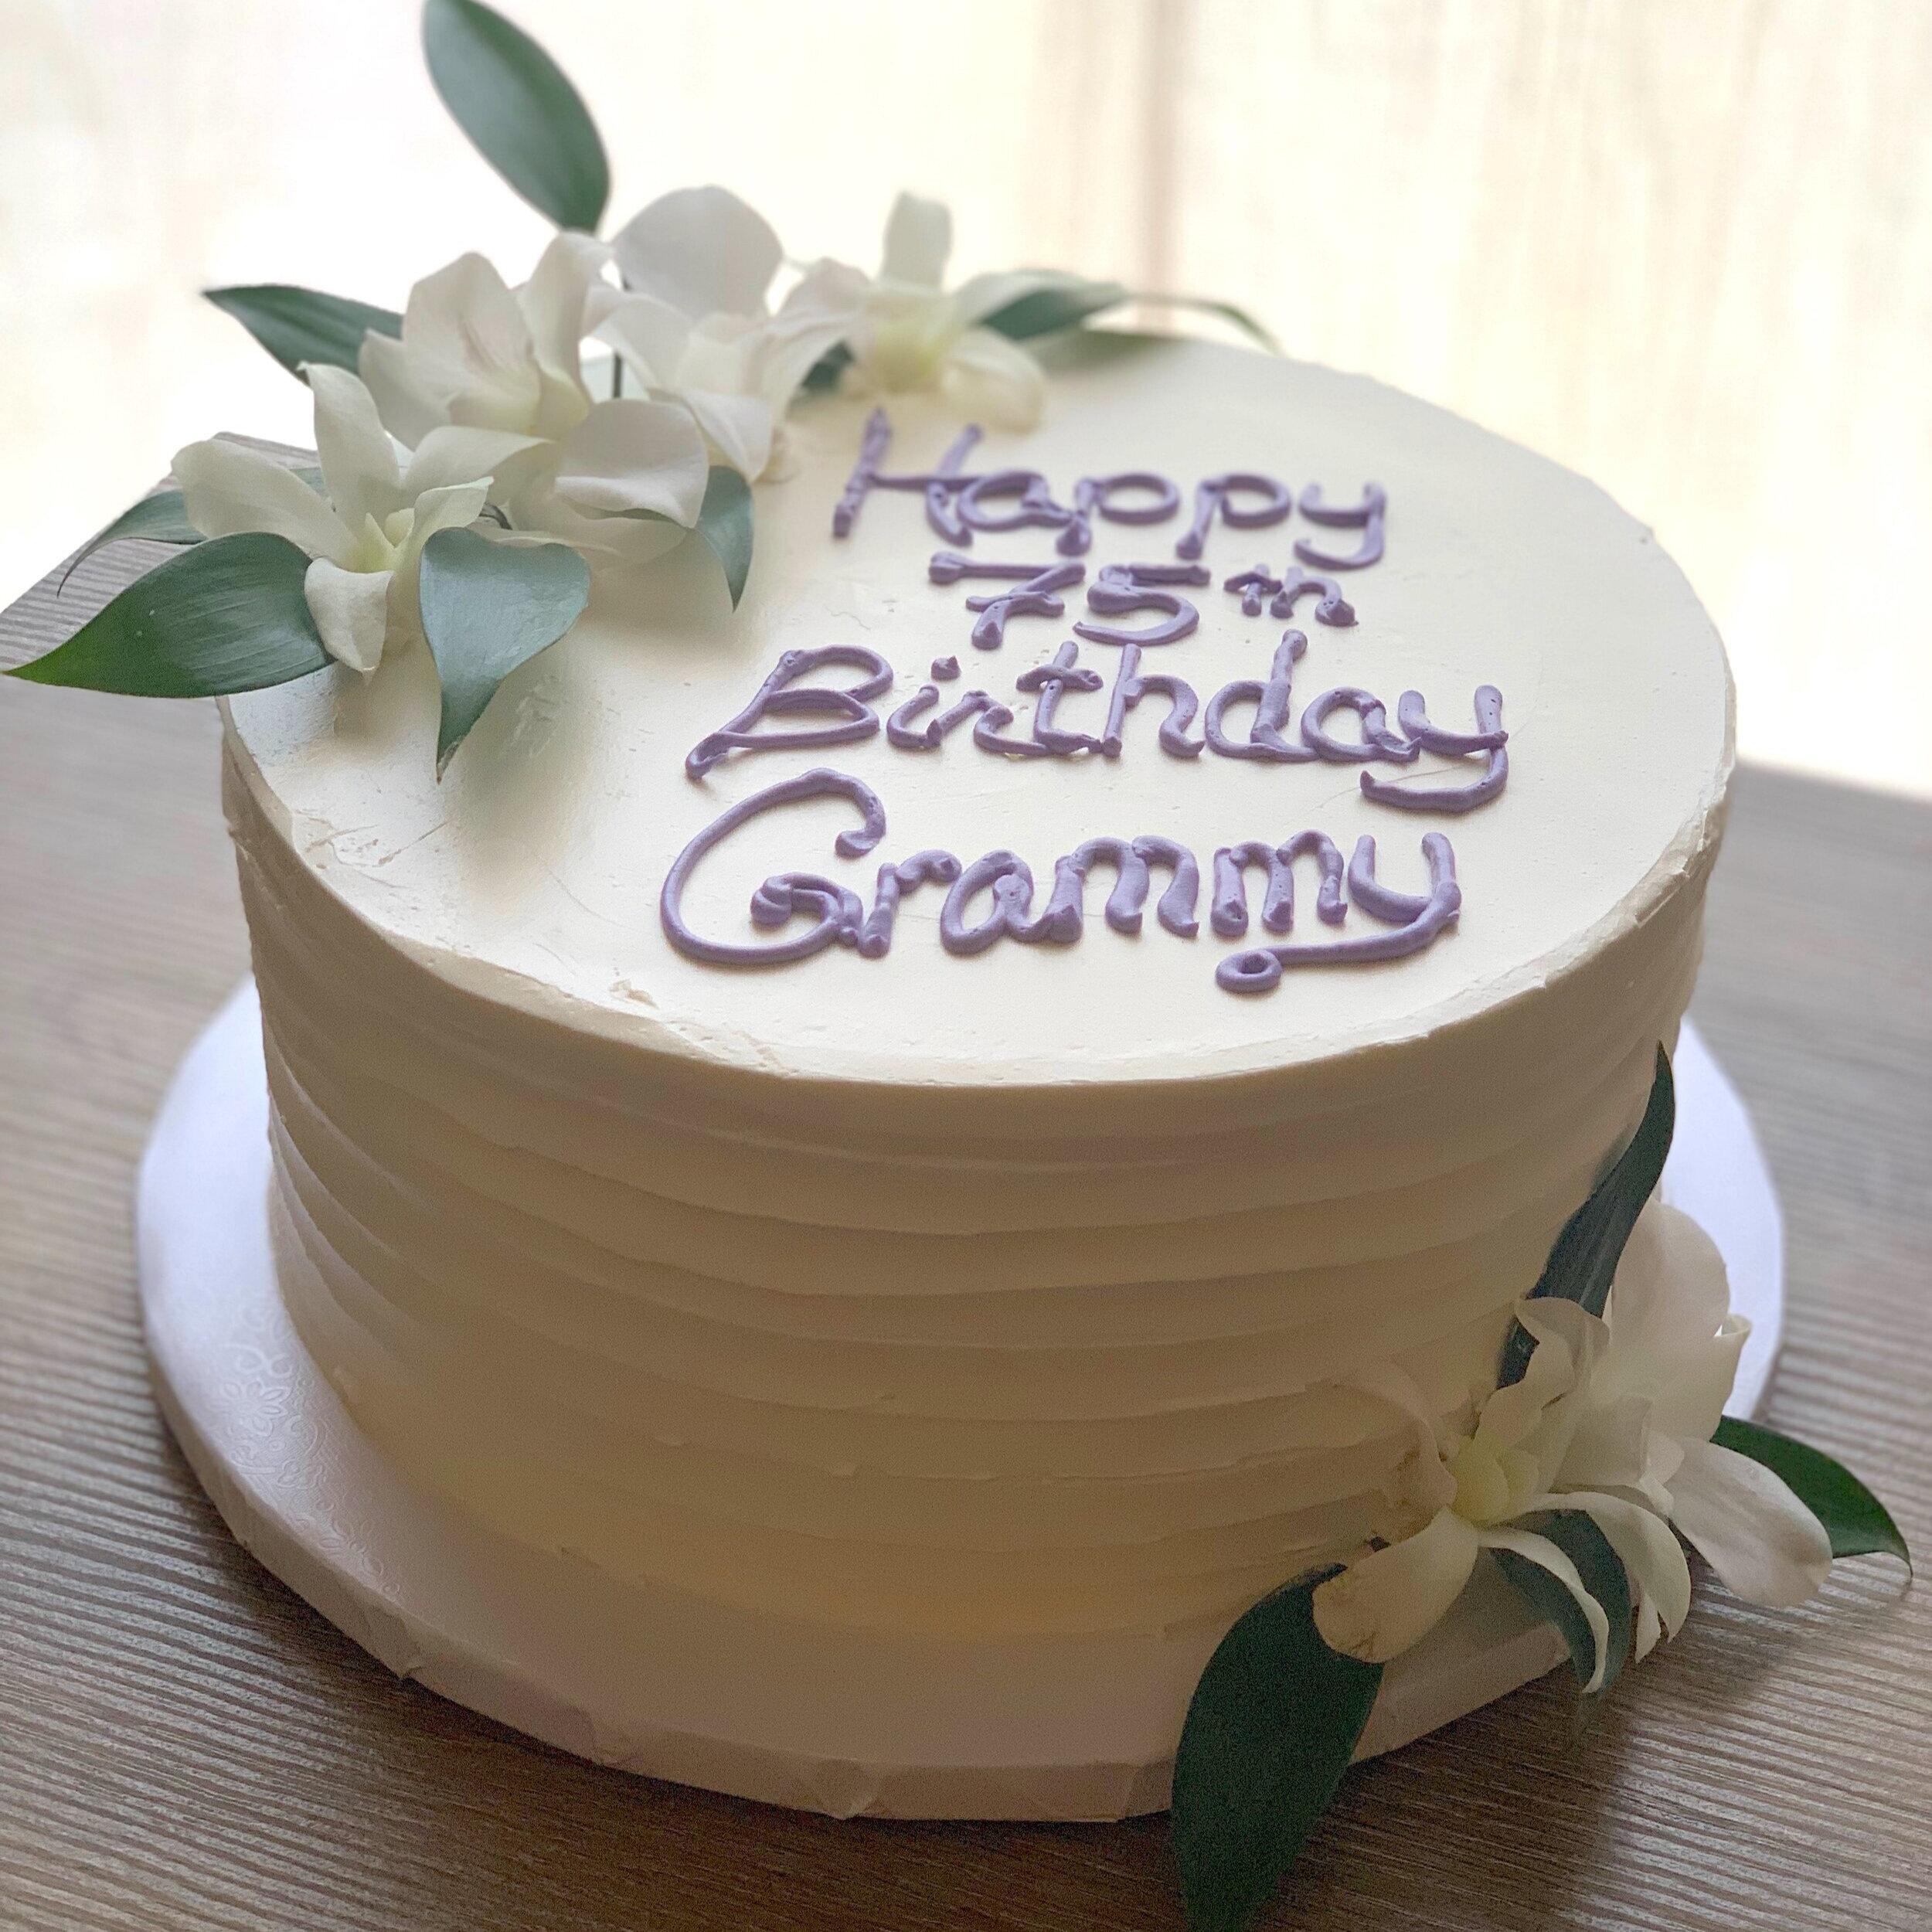 Lilikoi Vanilla Cake with fresh White Orchids